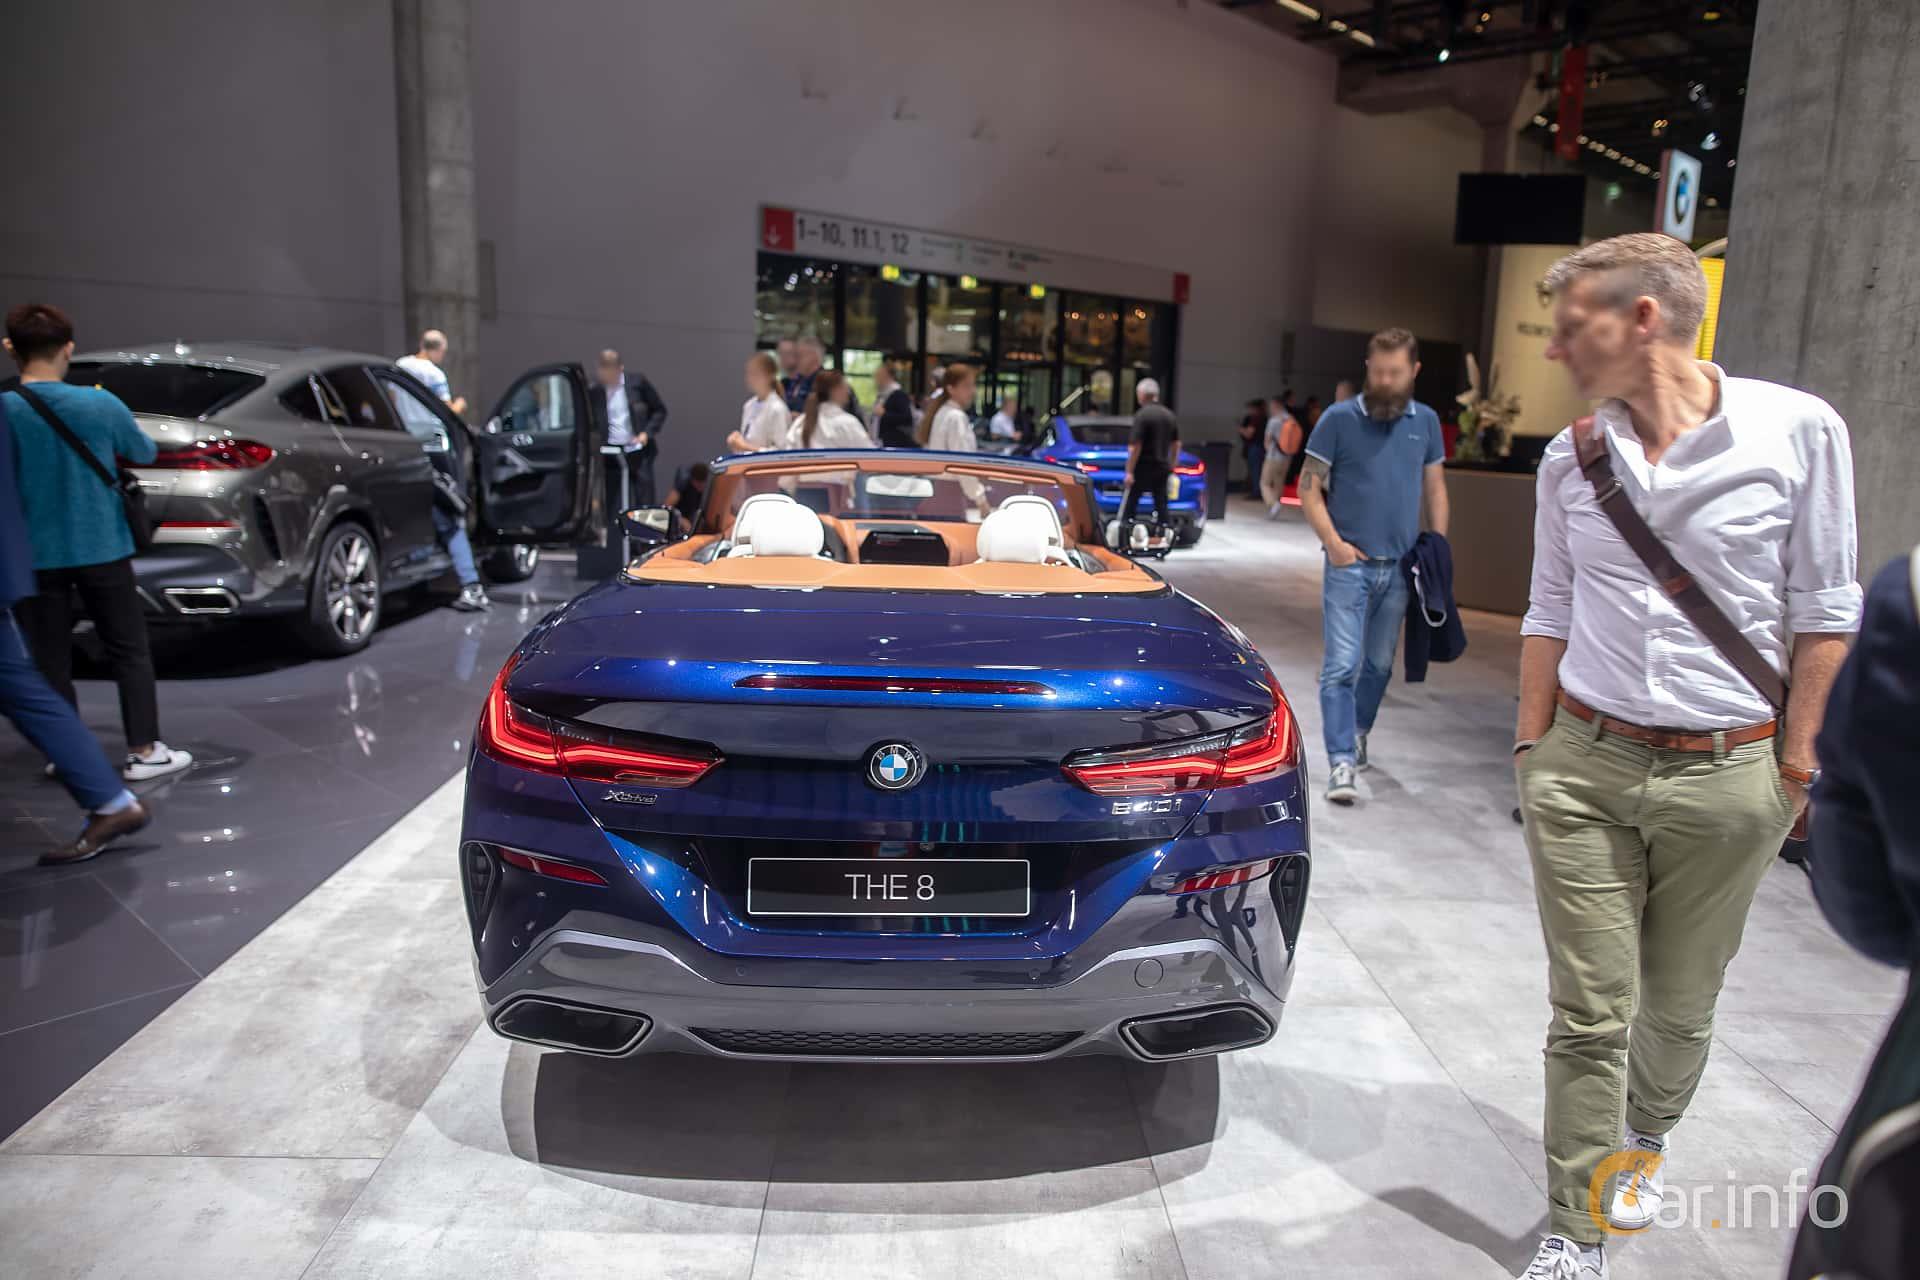 BMW 840i Convertible  Steptronic, 340hp, 2020 at IAA 2019